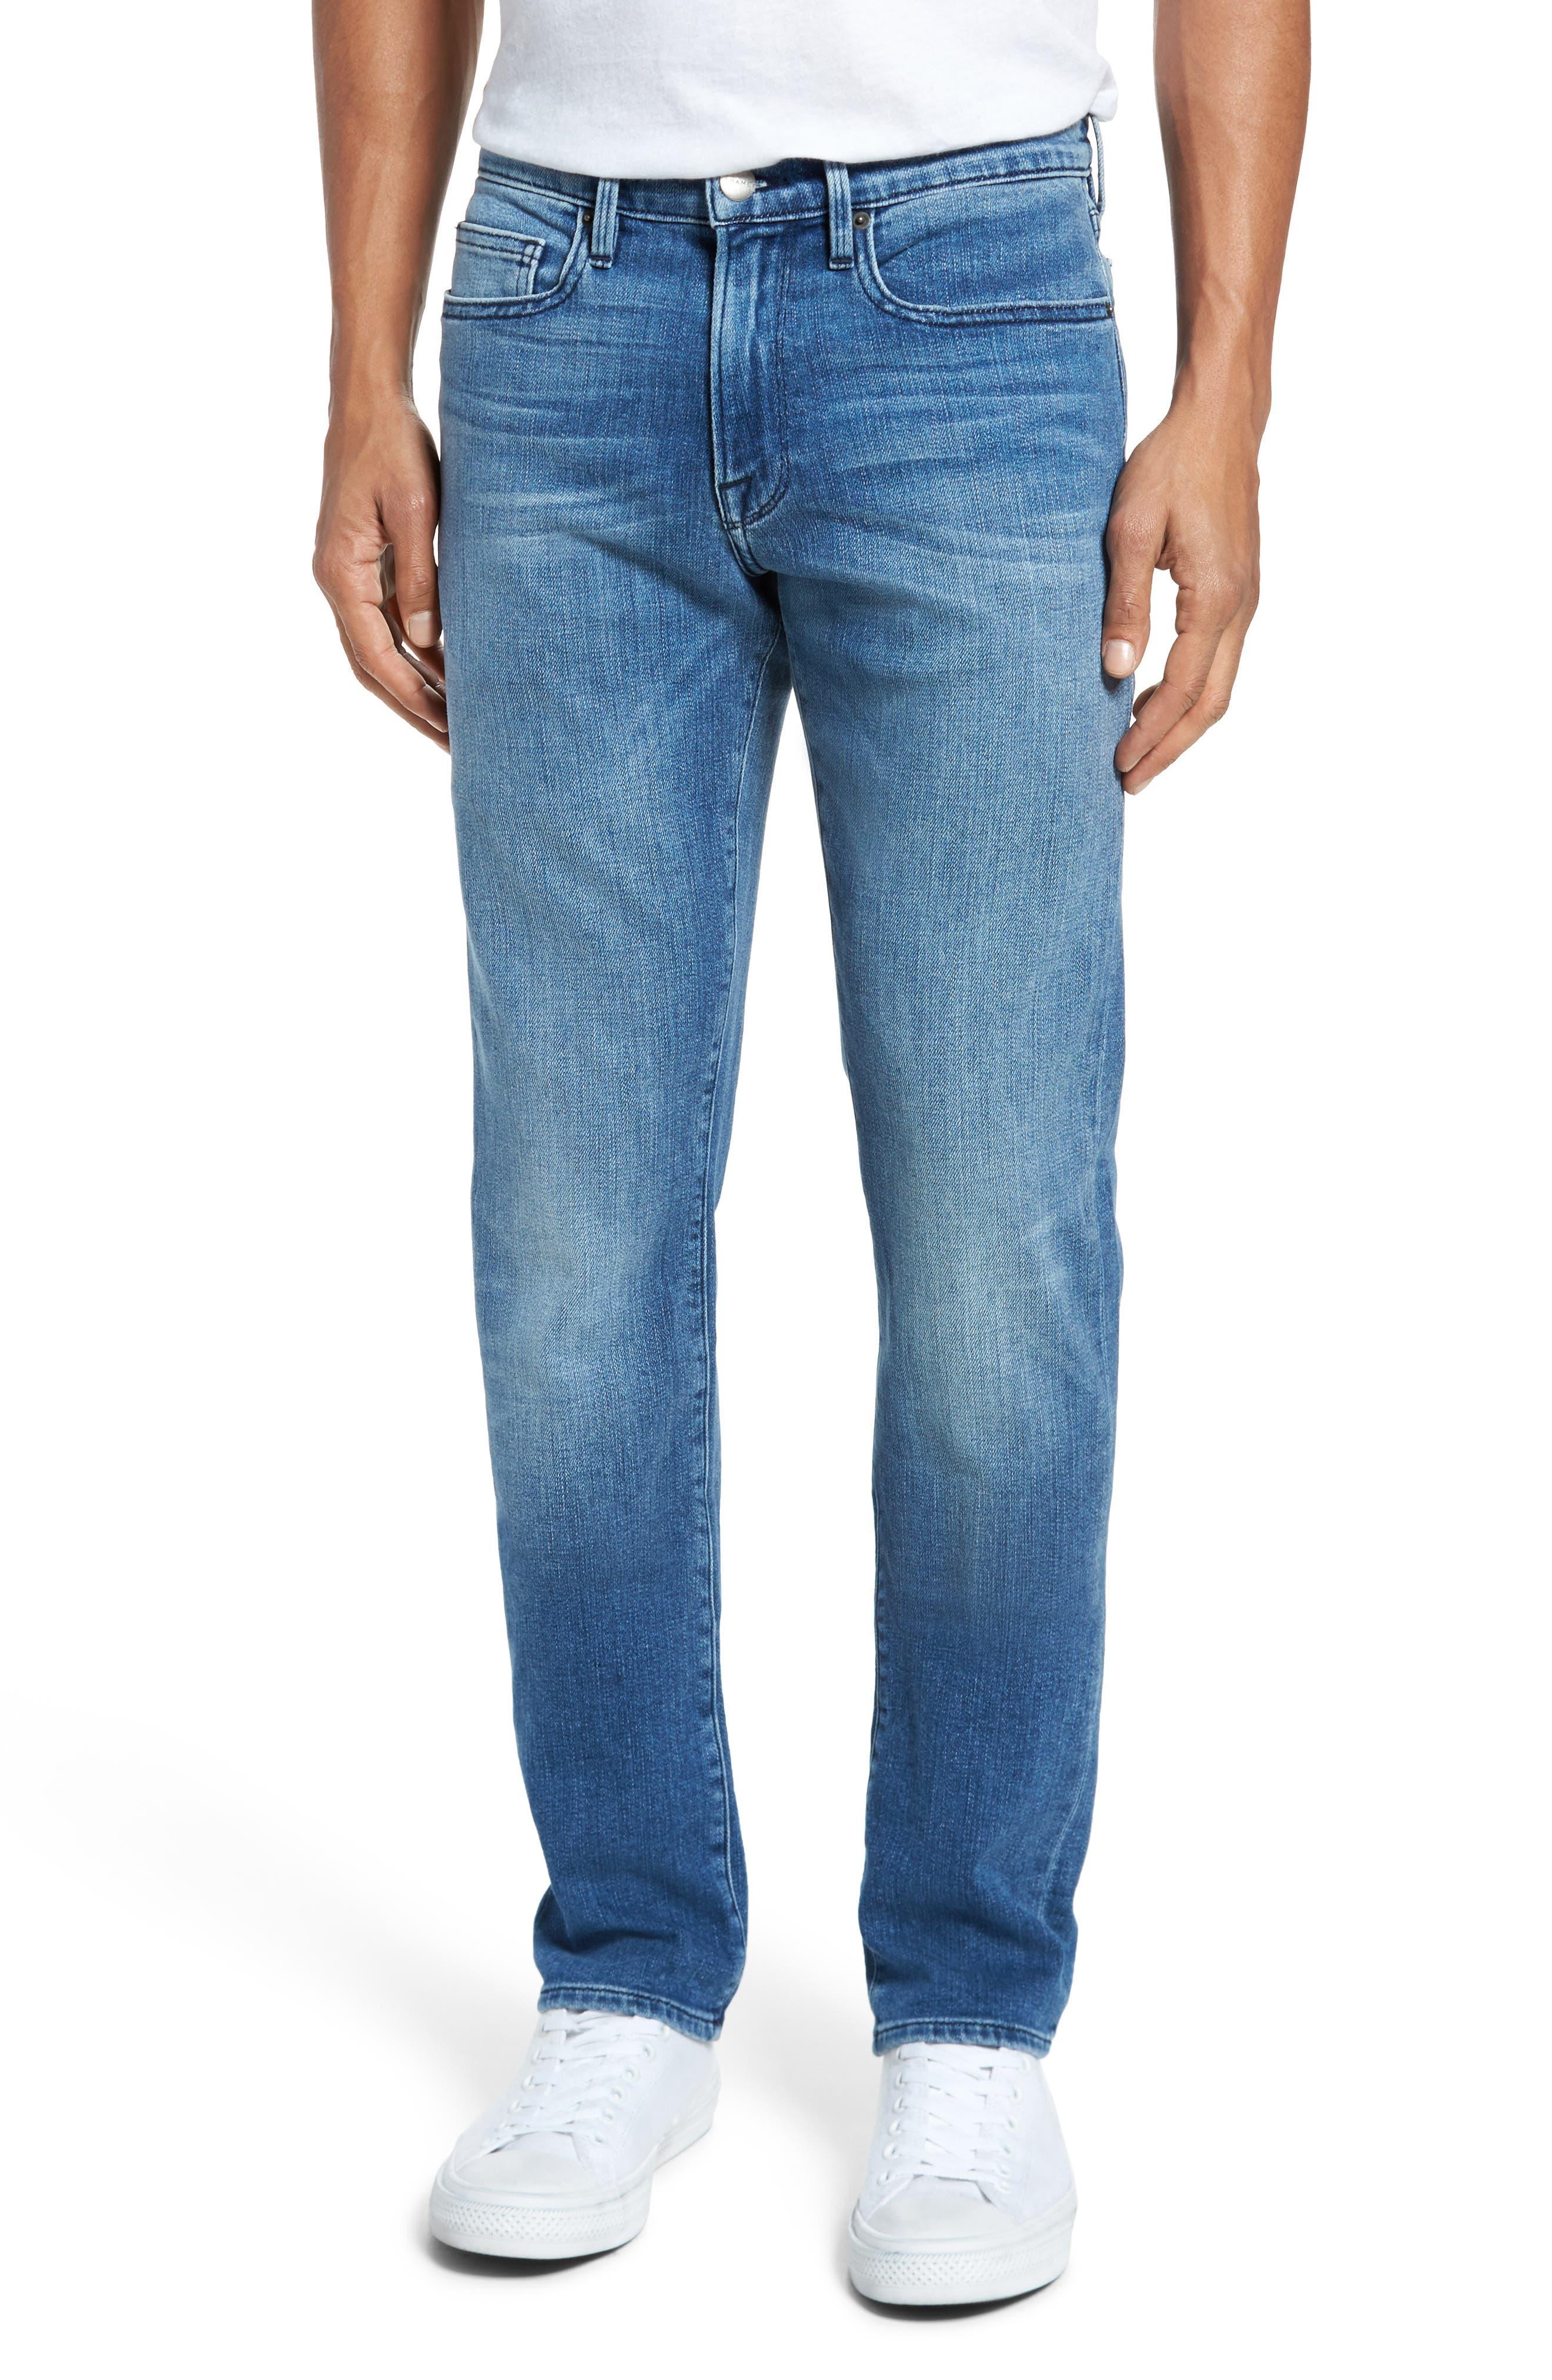 FRAME L'Homme Slim Fit Jeans (Bradbury)